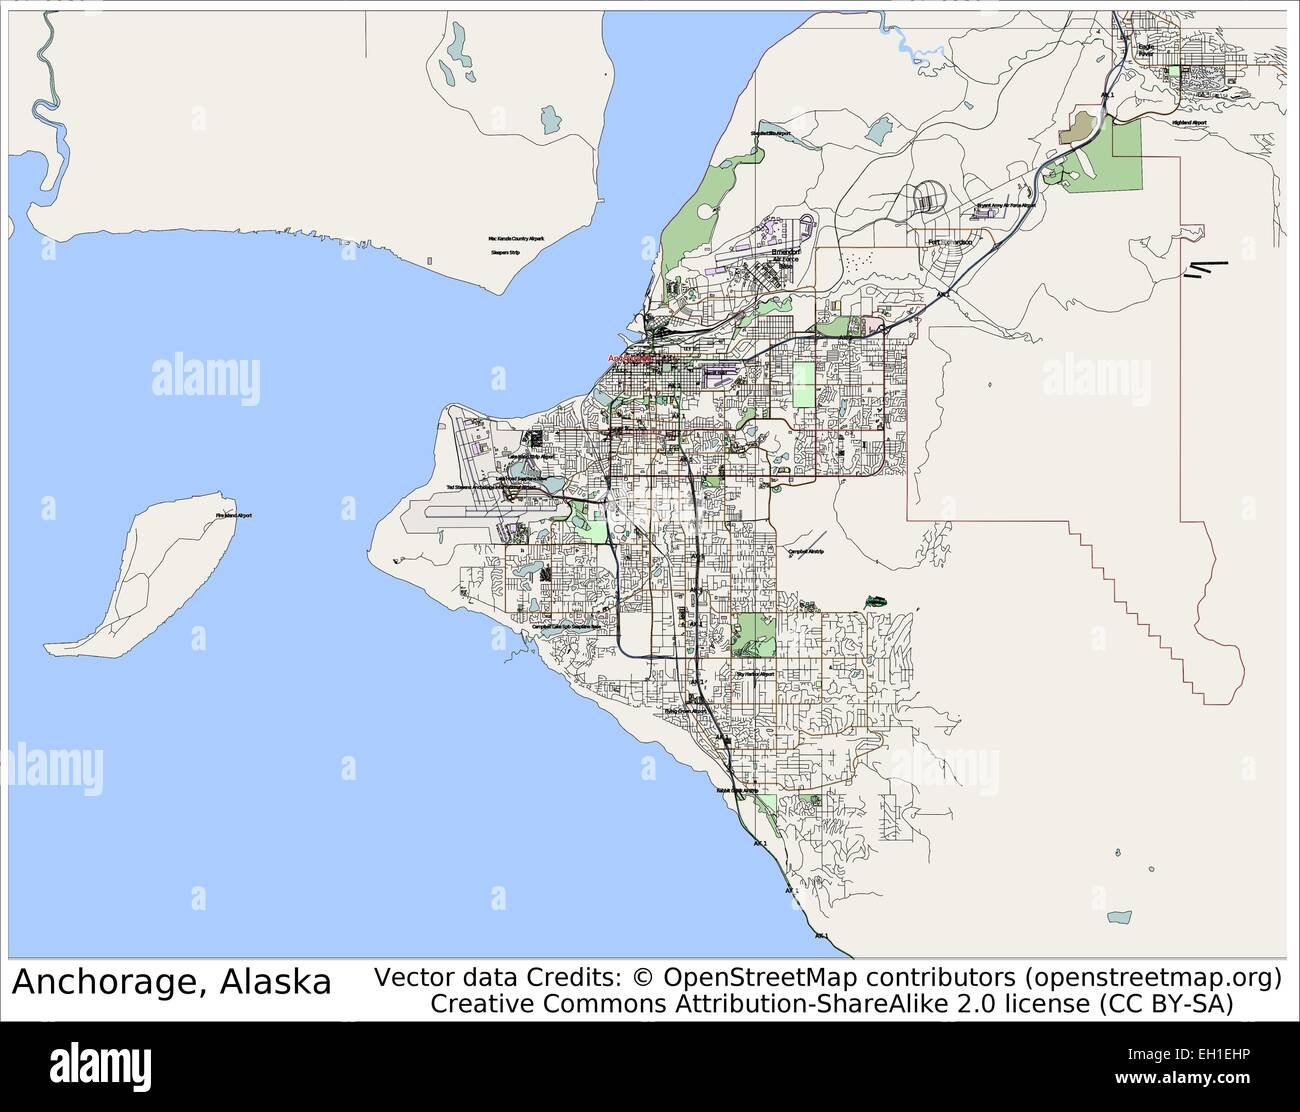 Anchorage Alaska USA city map Stock Vector Art & Illustration ...